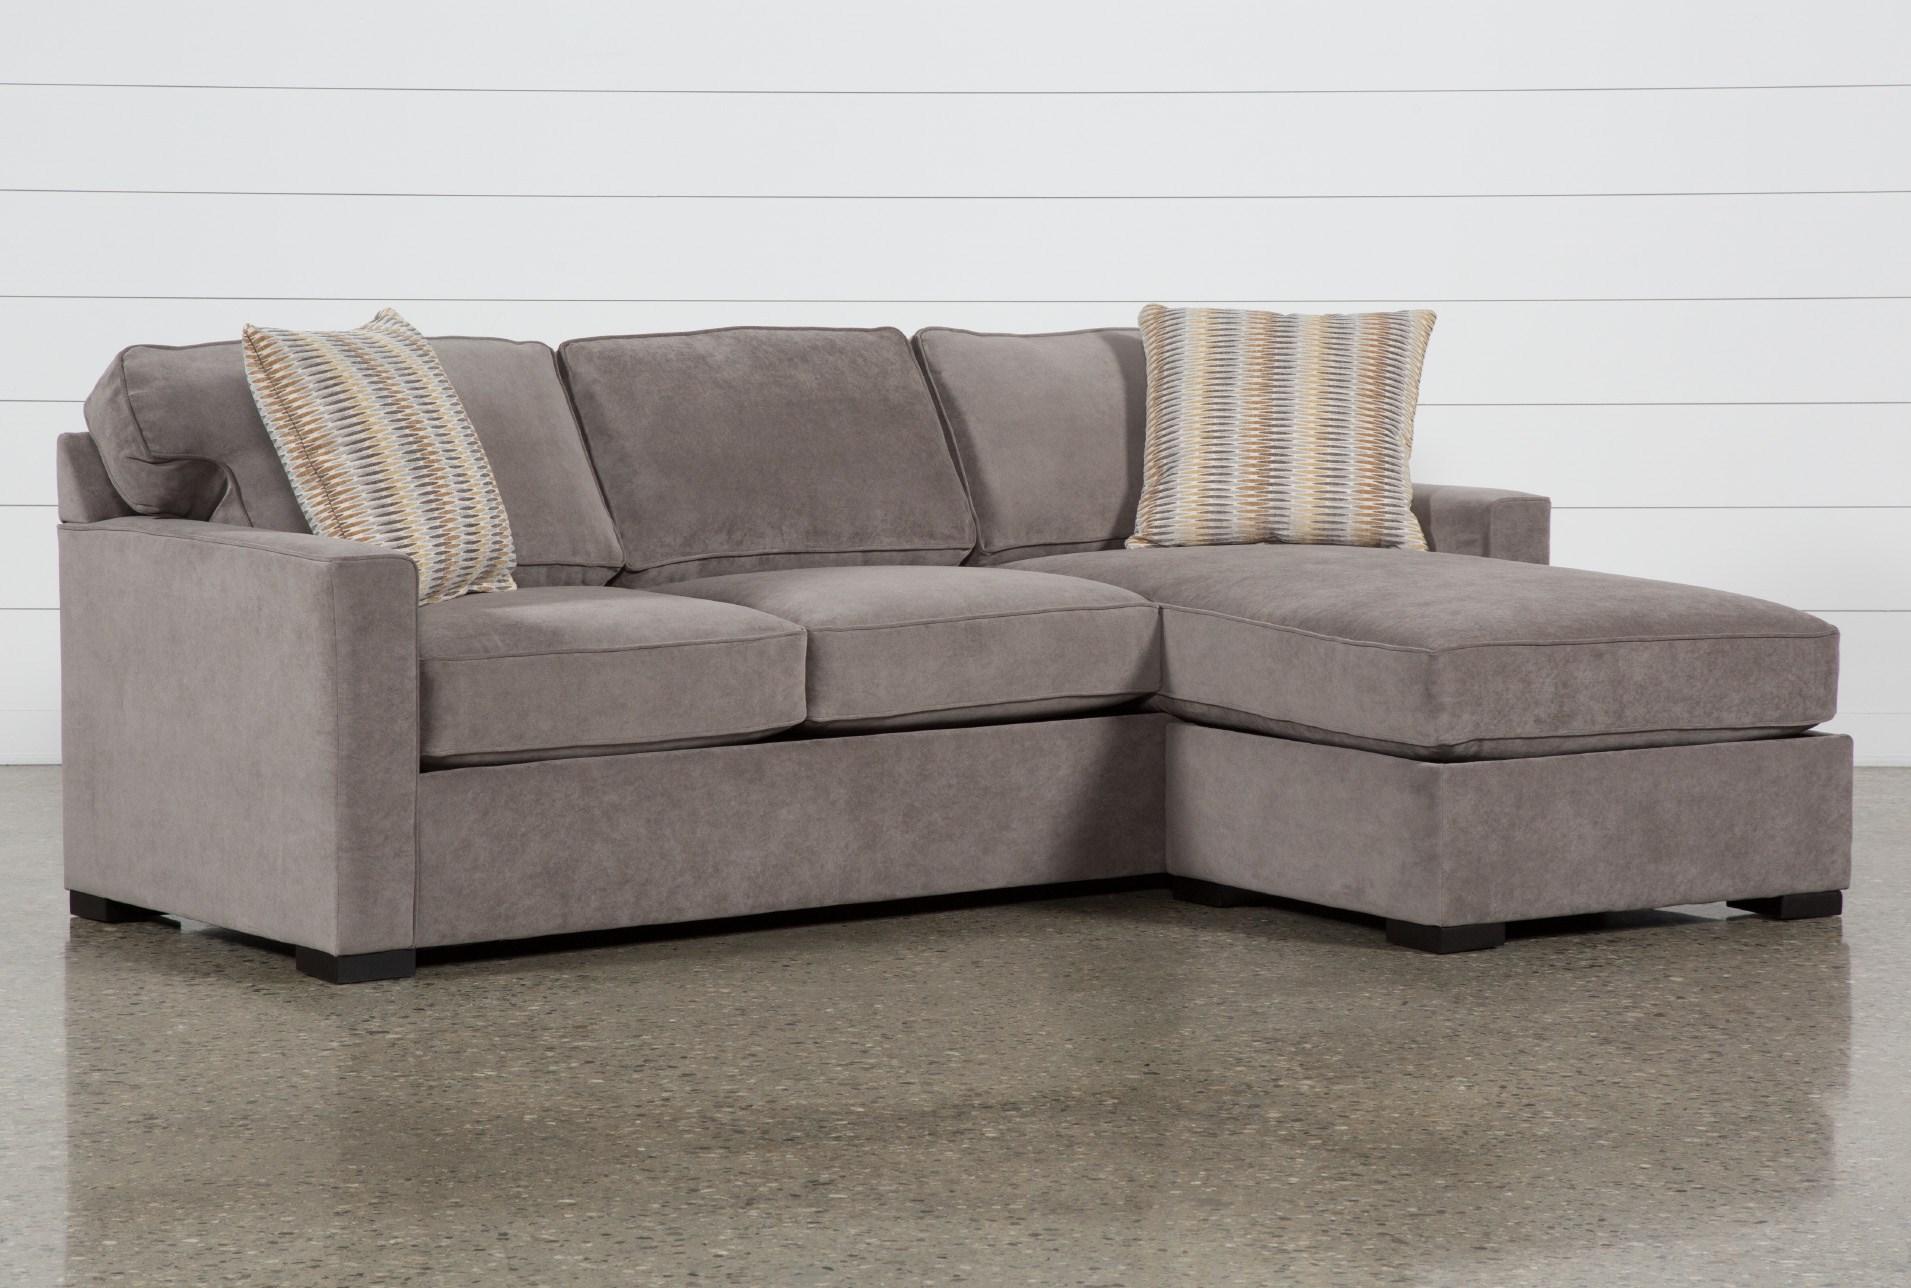 Taren Ii Reversible Sofa Chaise Sleeper W Storage Ottoman Living